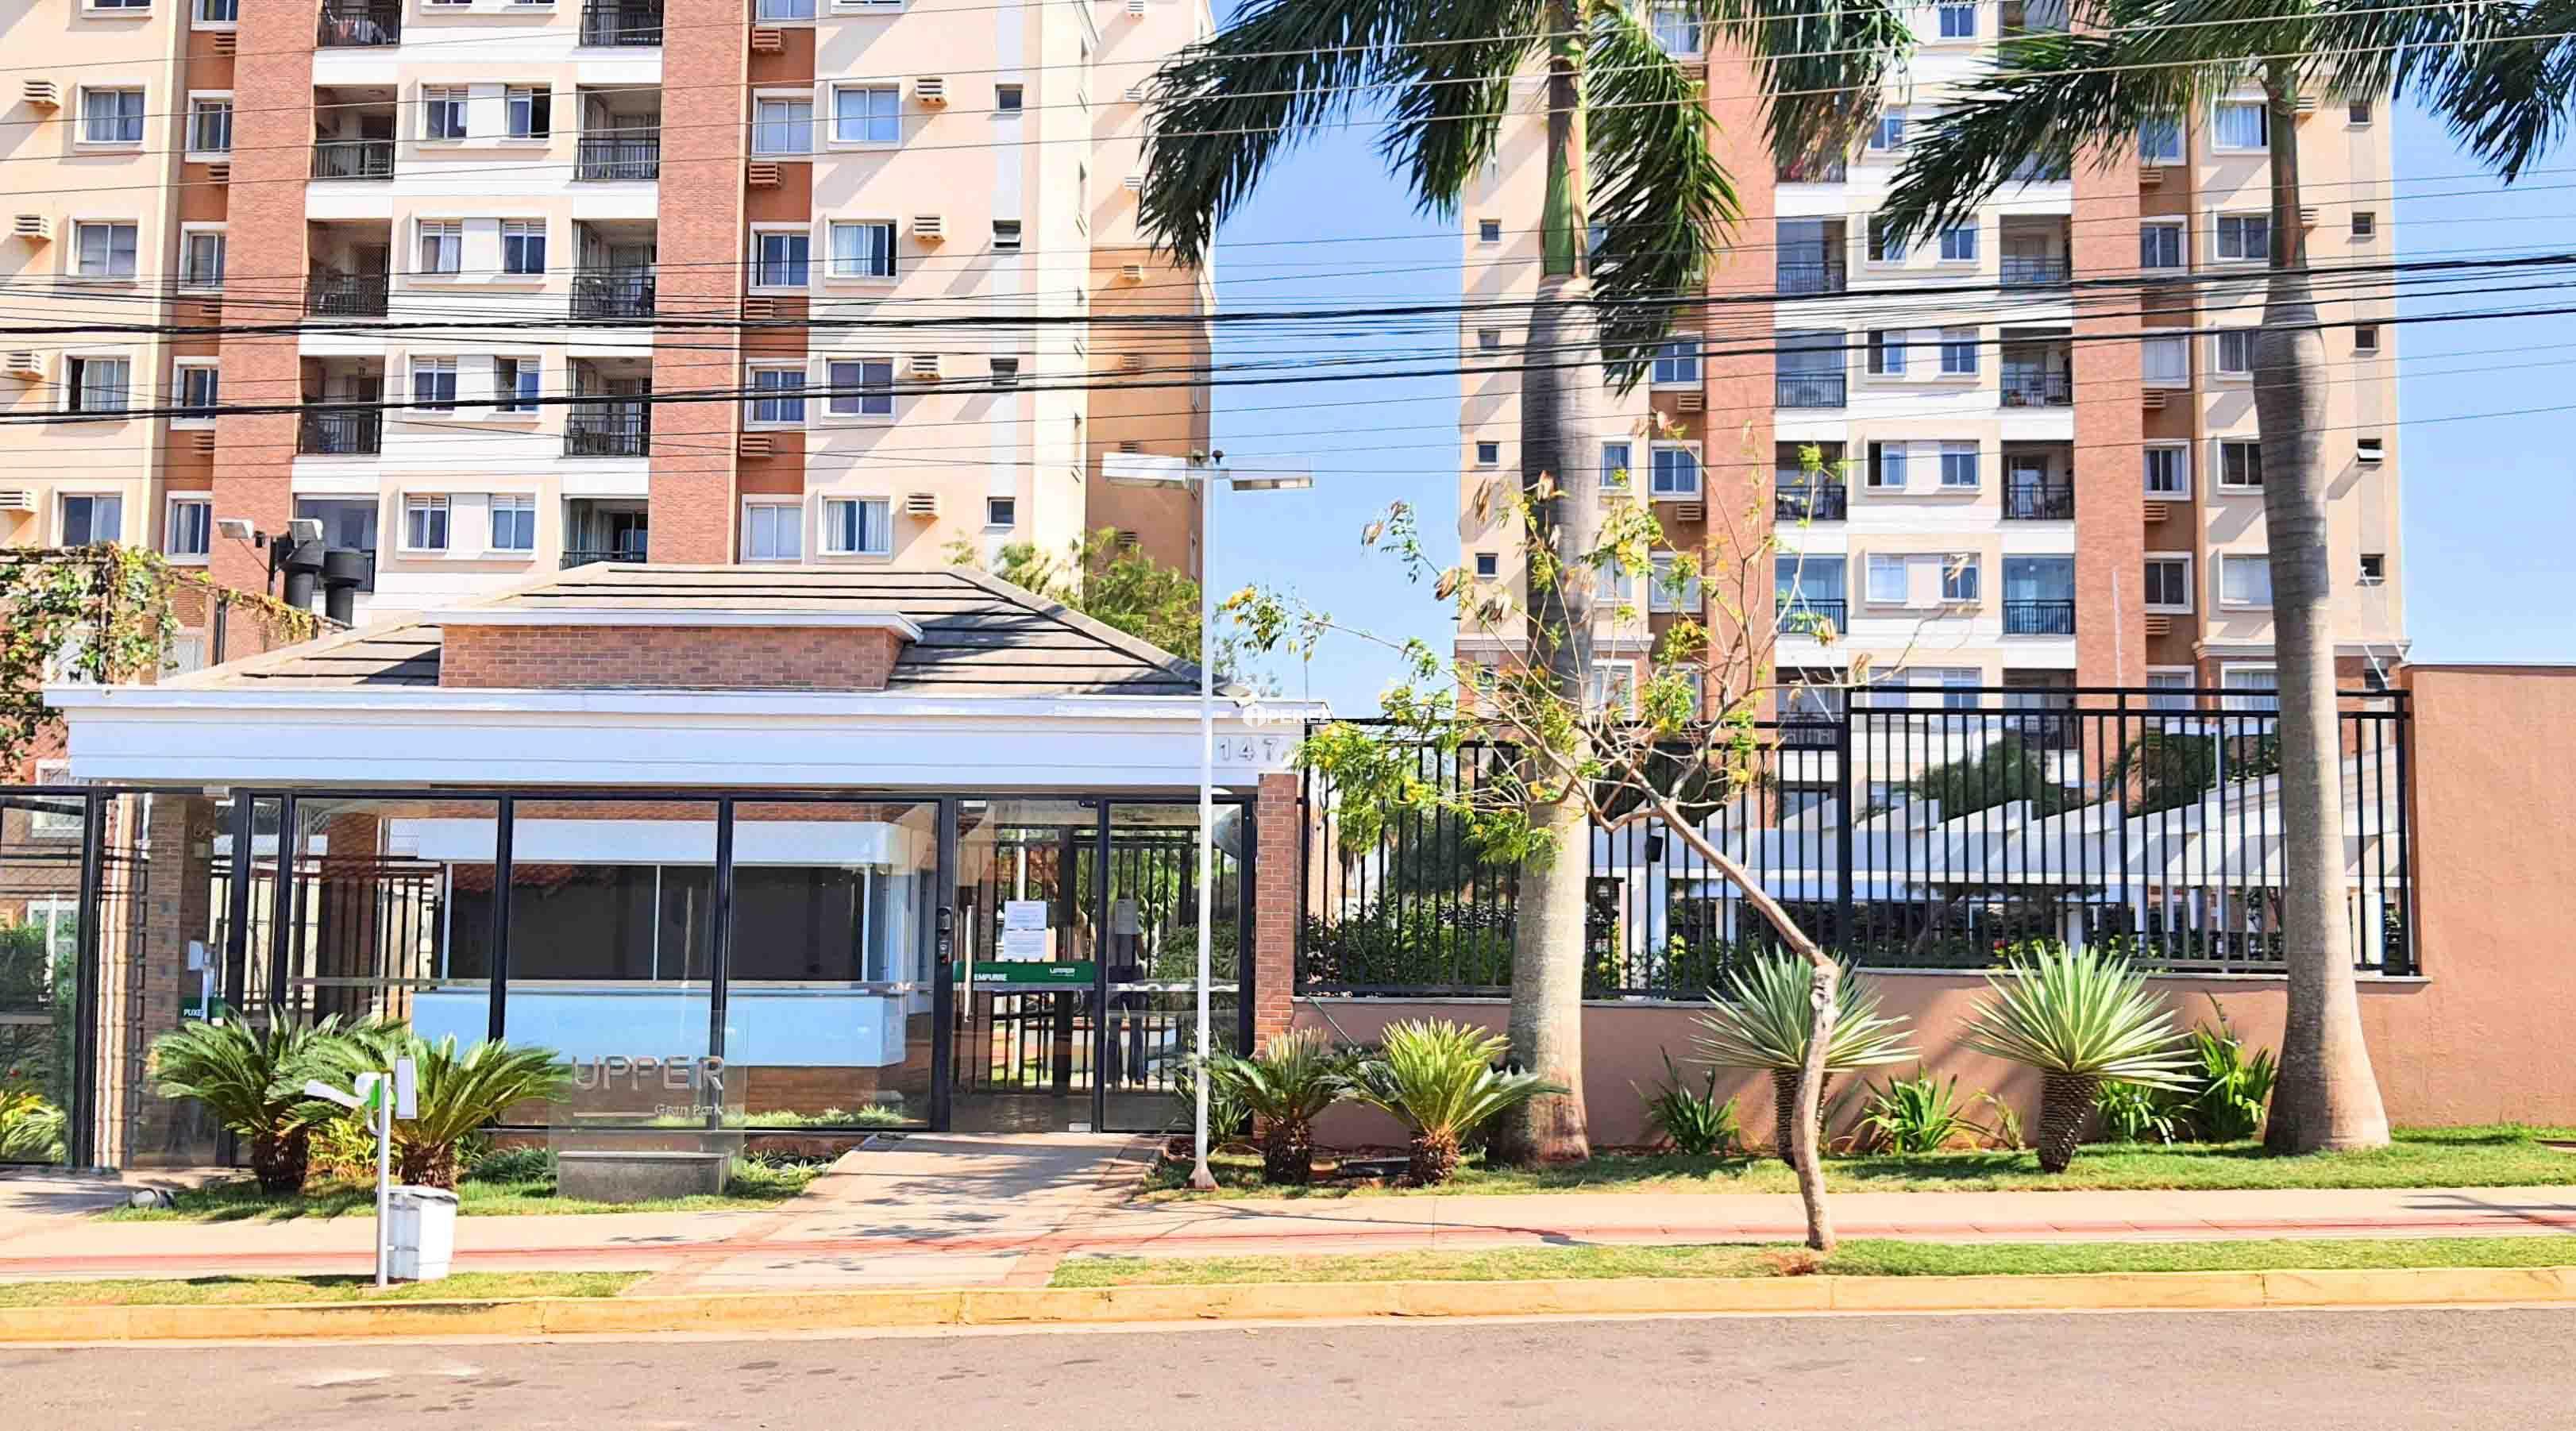 venda-campo-grande-ms-apartamento-afro-puga-mata-do-jacinto-perez-imoveis